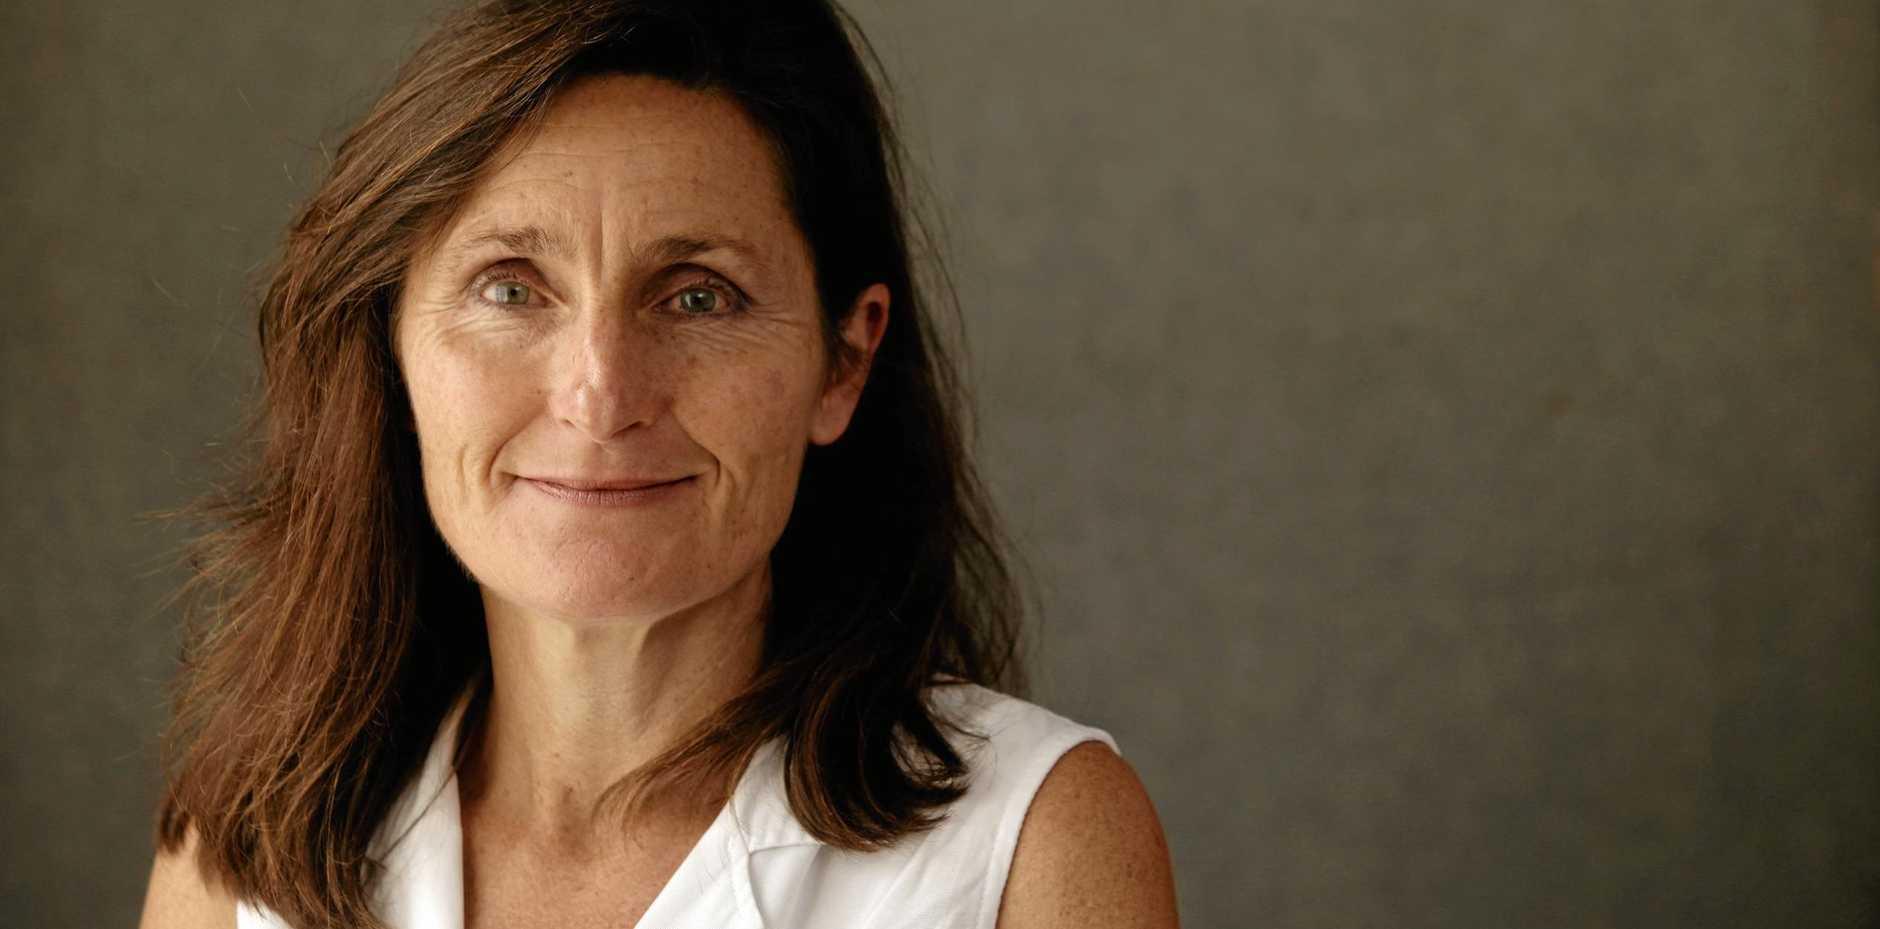 GOLD: Walkley Award-winner Joanne McCarthy will be guest speaker at the Soroptimists International Brisbane Water annual International Women's Day Breakfast on Sunday, March 11 as part of the Central Coast Festival of Women.